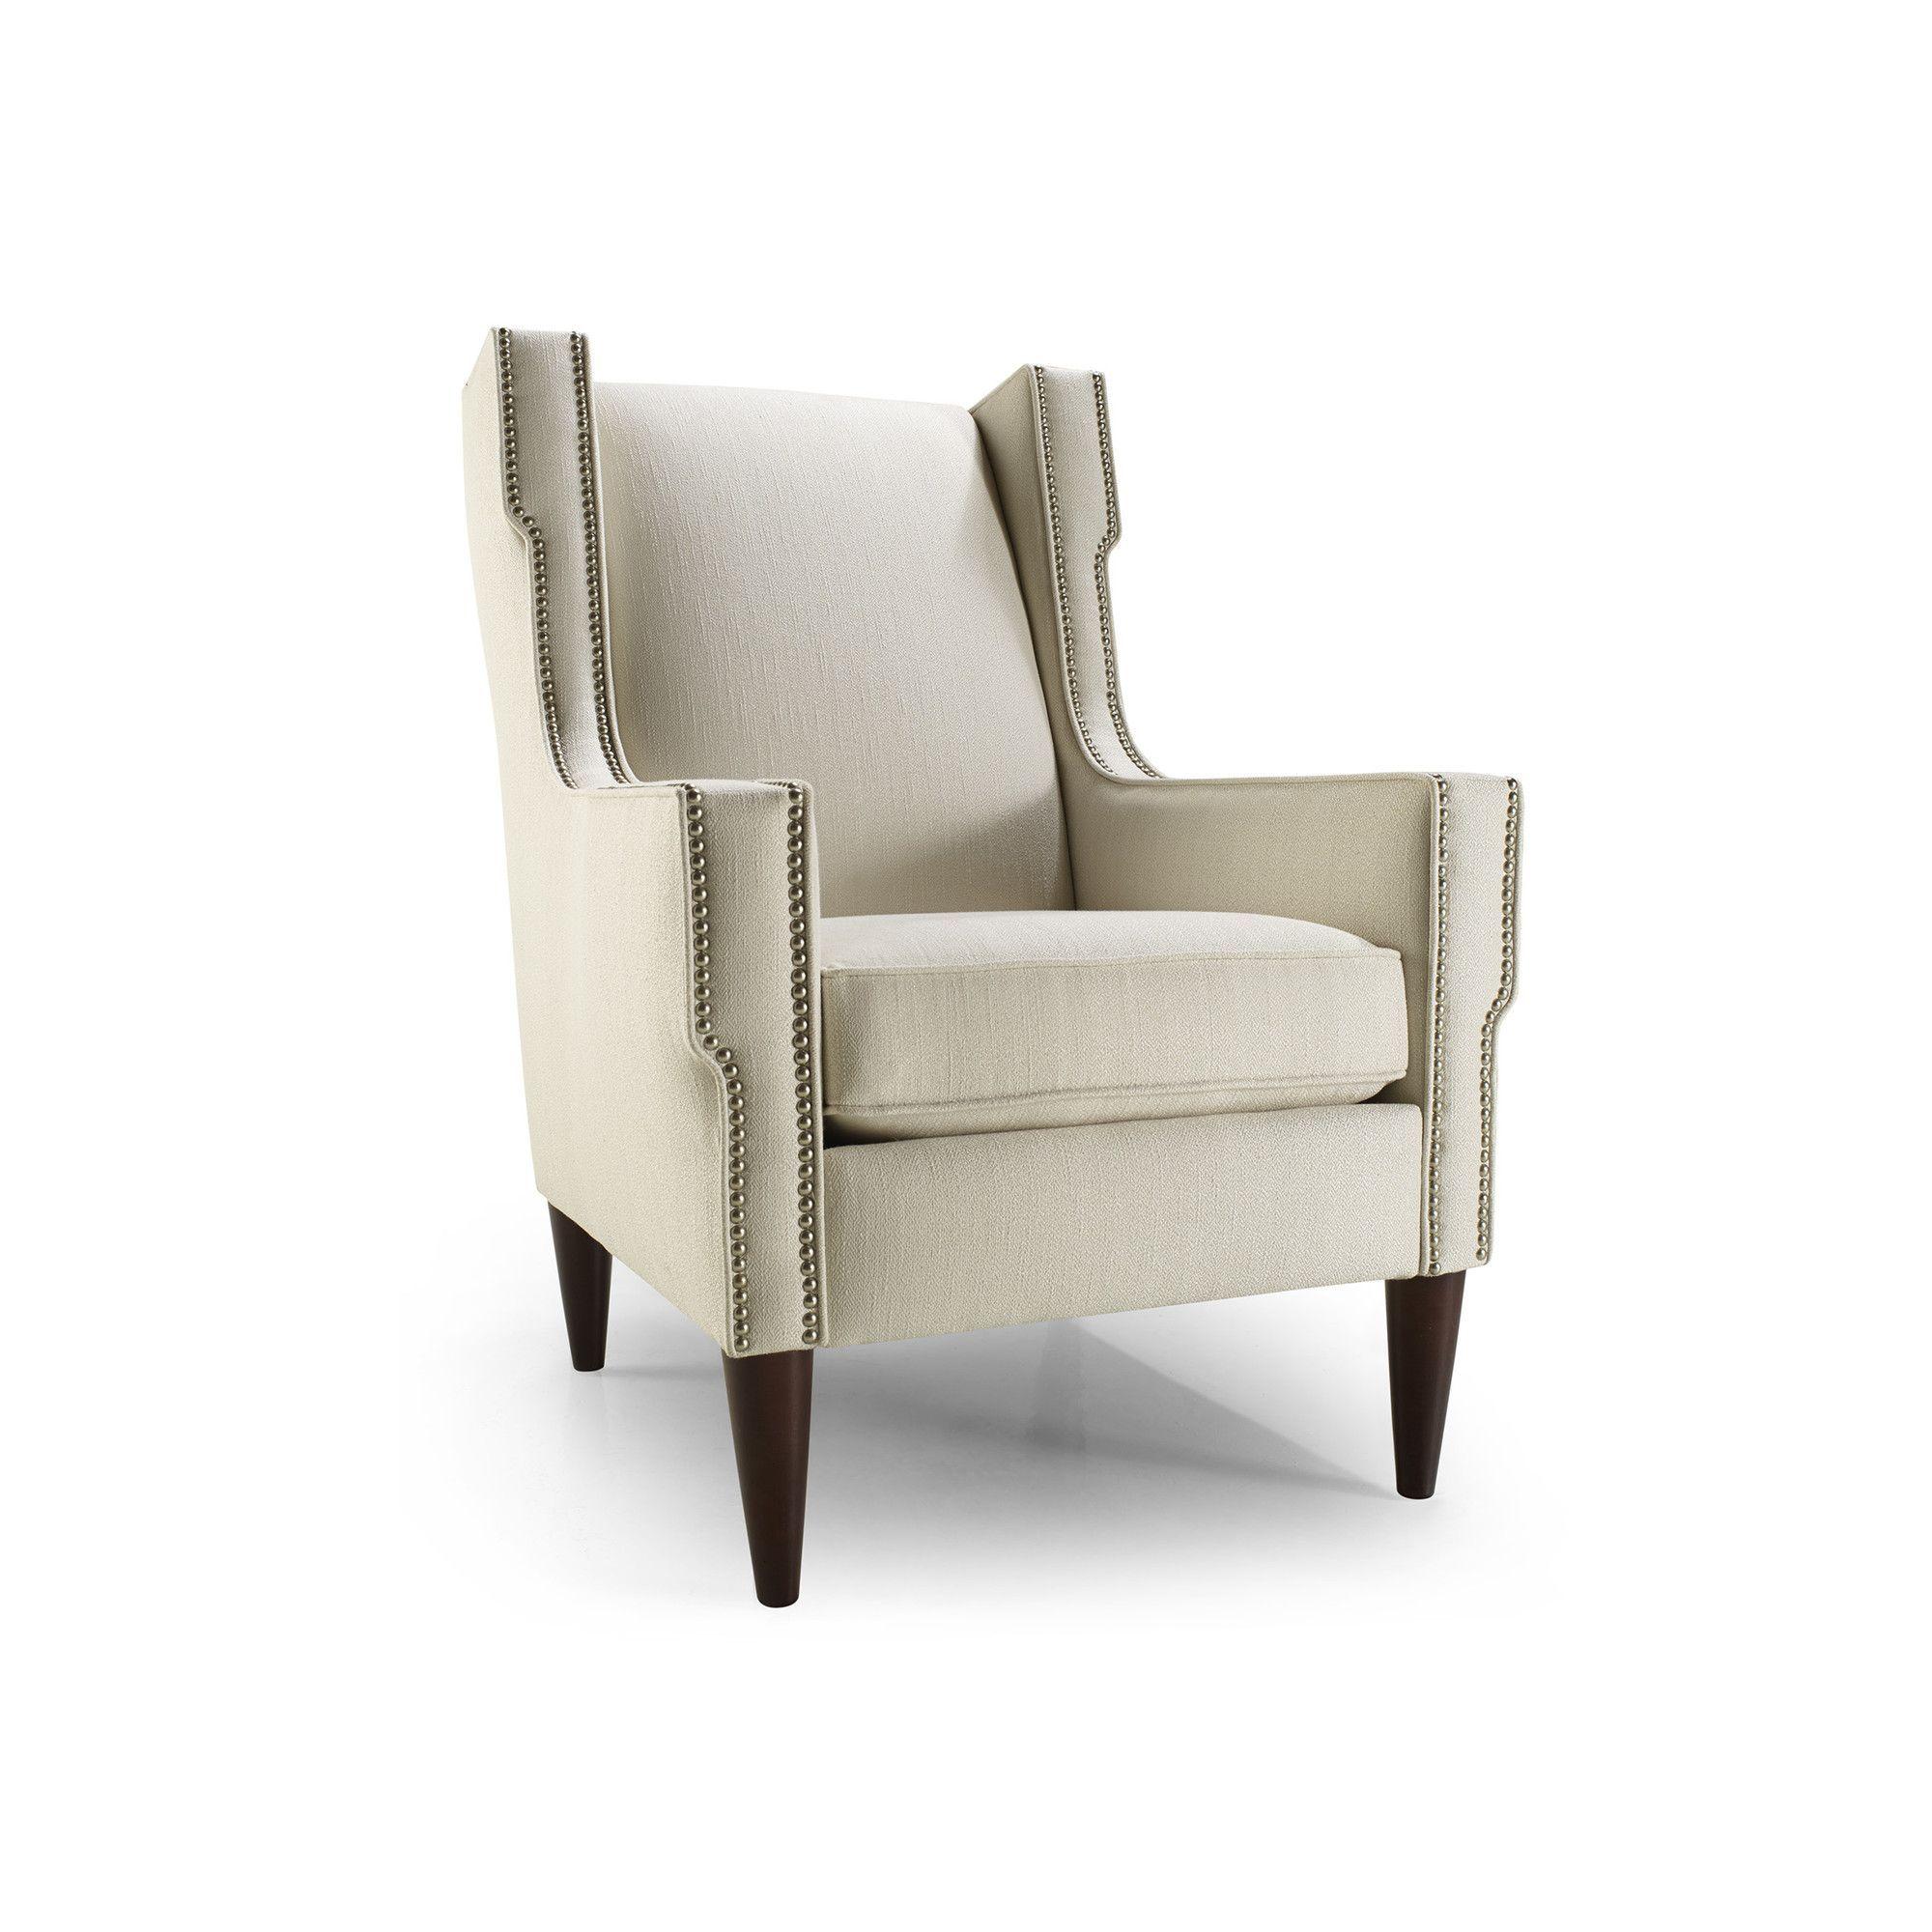 Homeware Peyton Sofa Room Quinn Arm Chair Products Accent Chairs Furniture